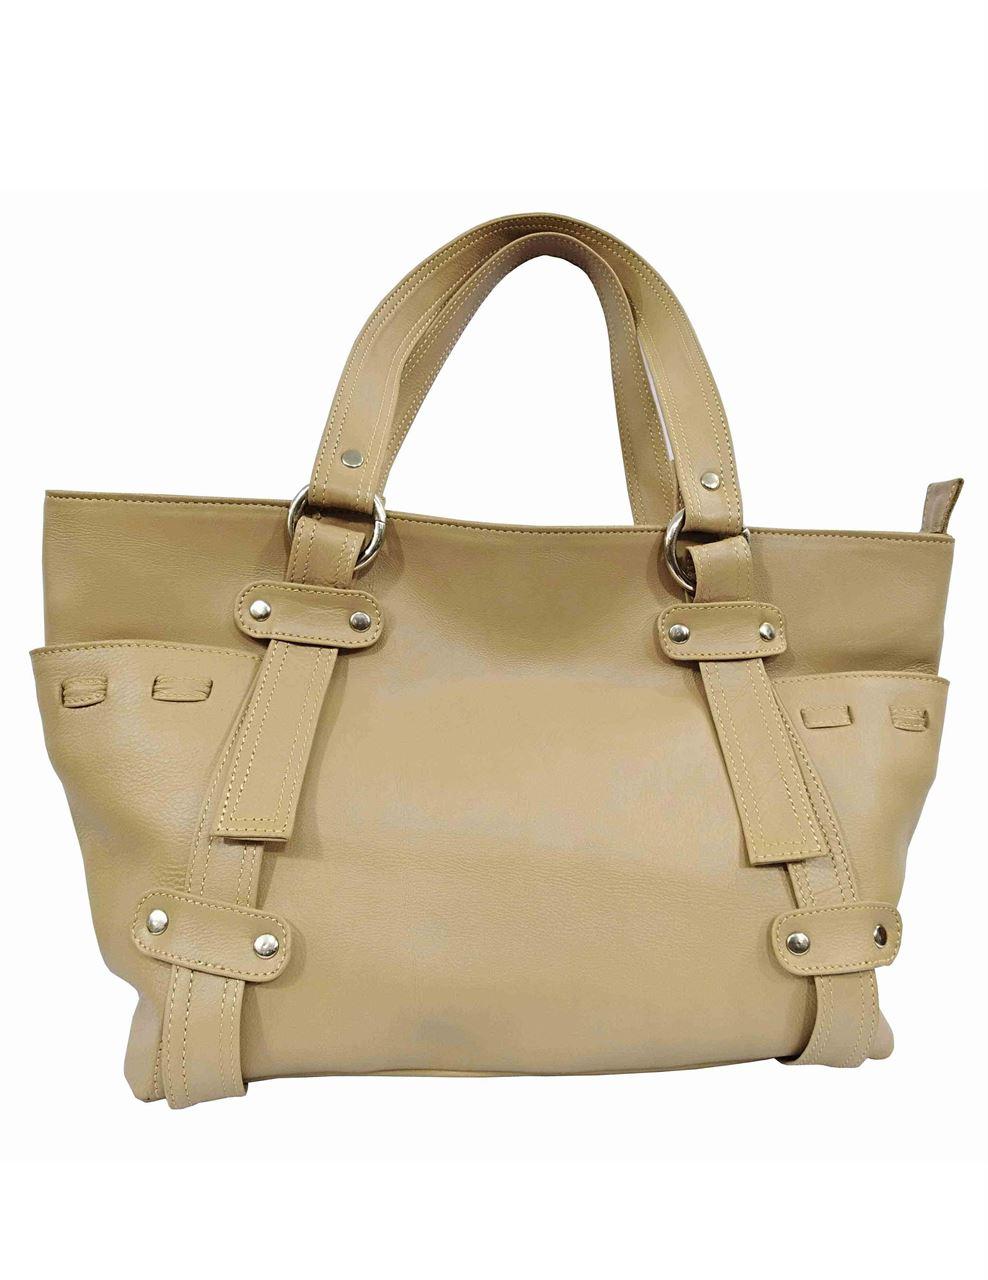 1769fc0012d Online Shopping Bangladesh  Women s Leather Handbag-LHB-113-Biscuit